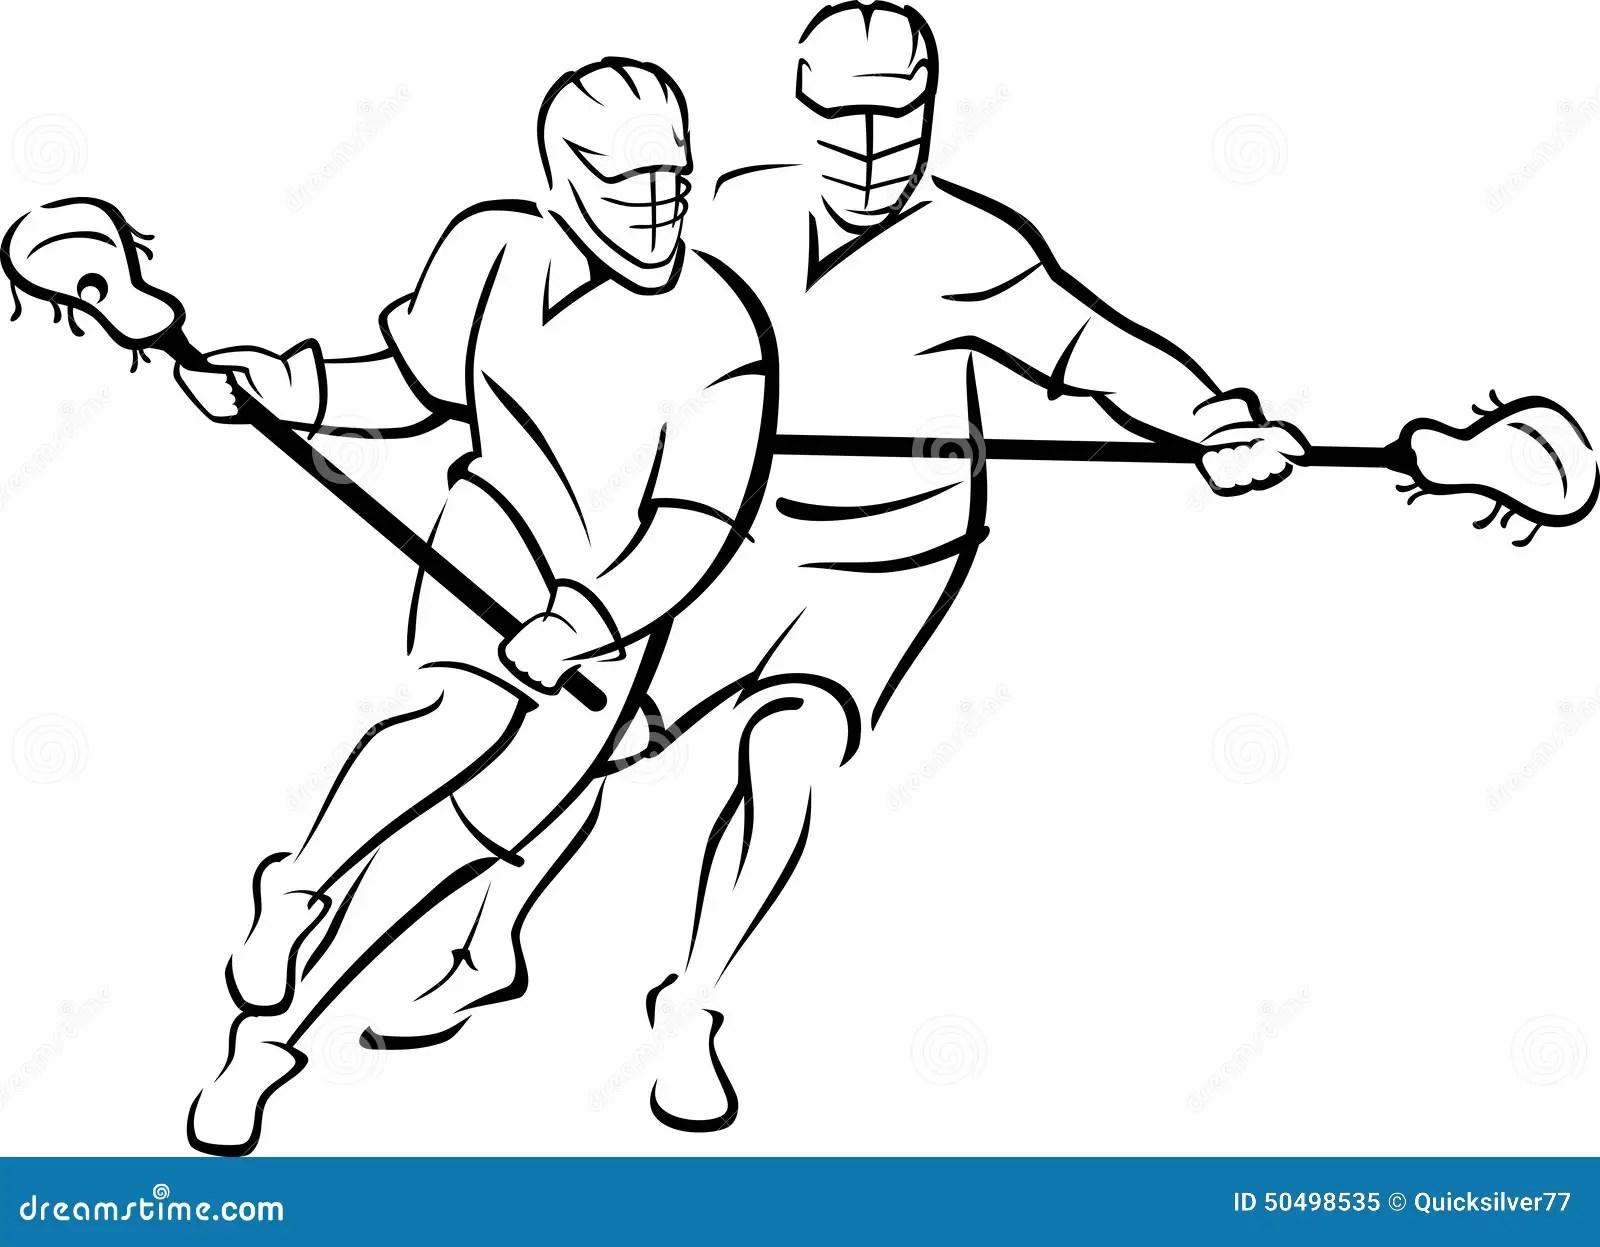 Lacrosse Match Stock Vector